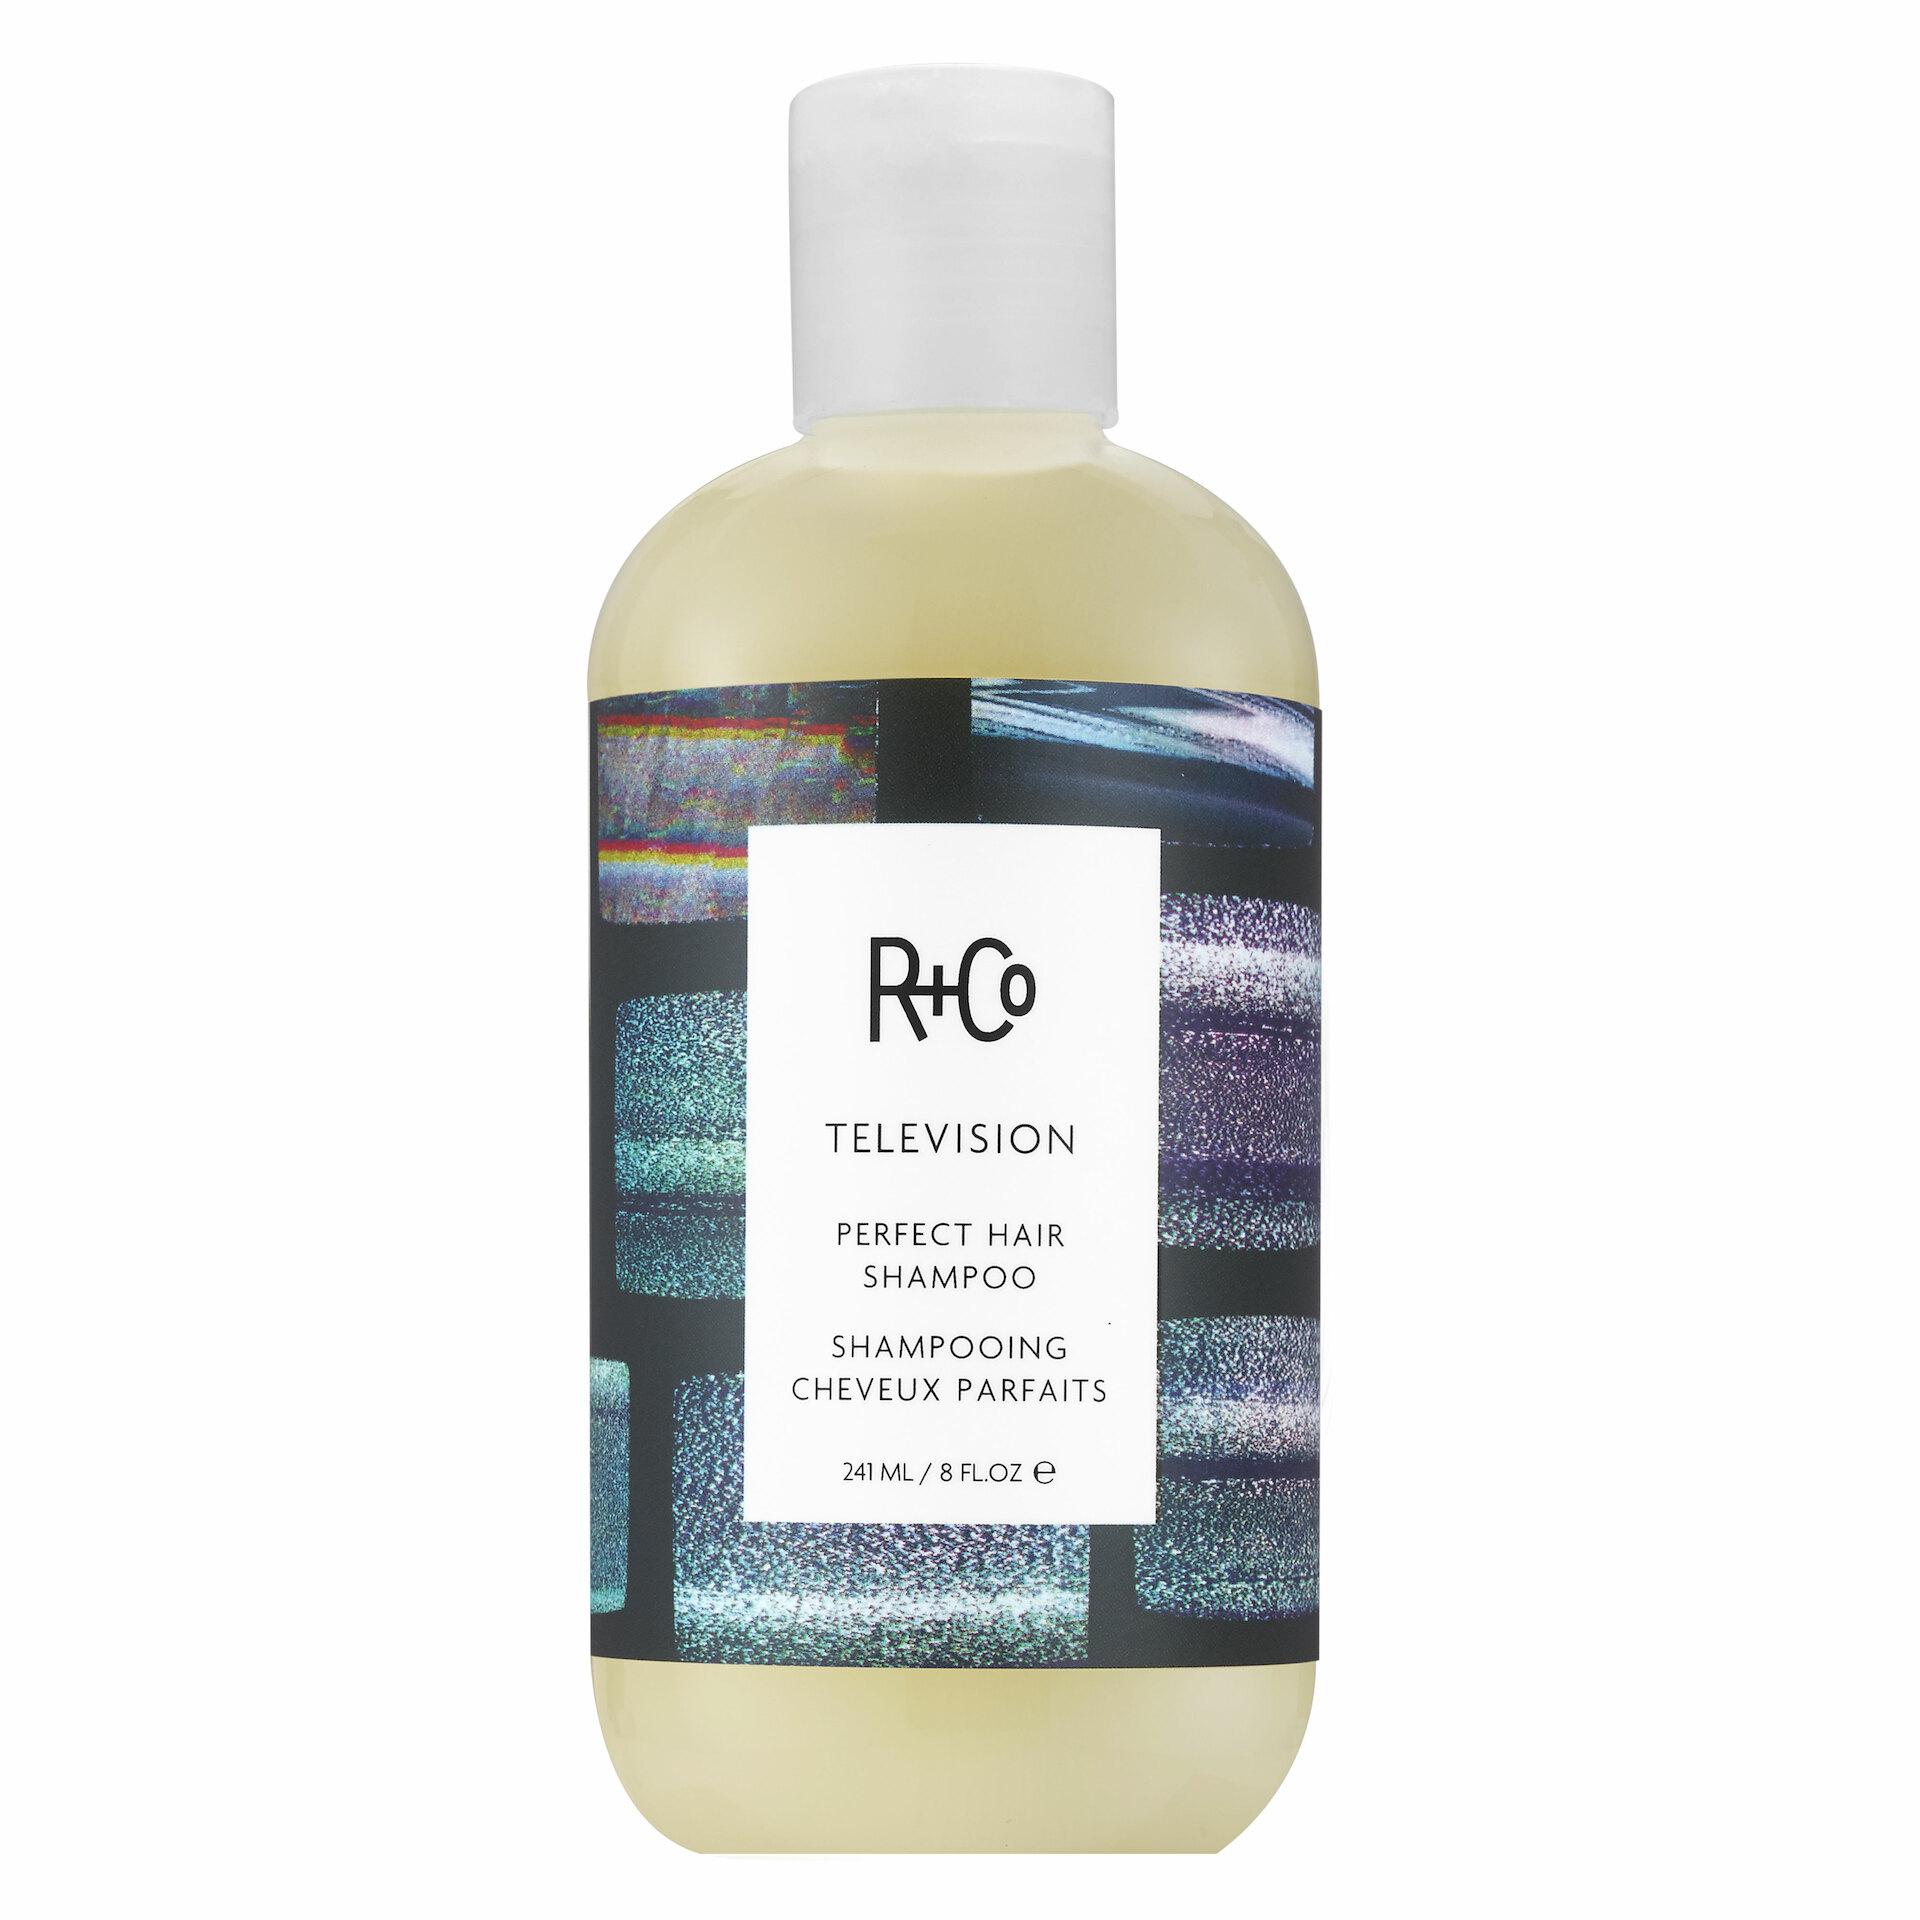 TELEVISION Perfect Shampoo 241ml